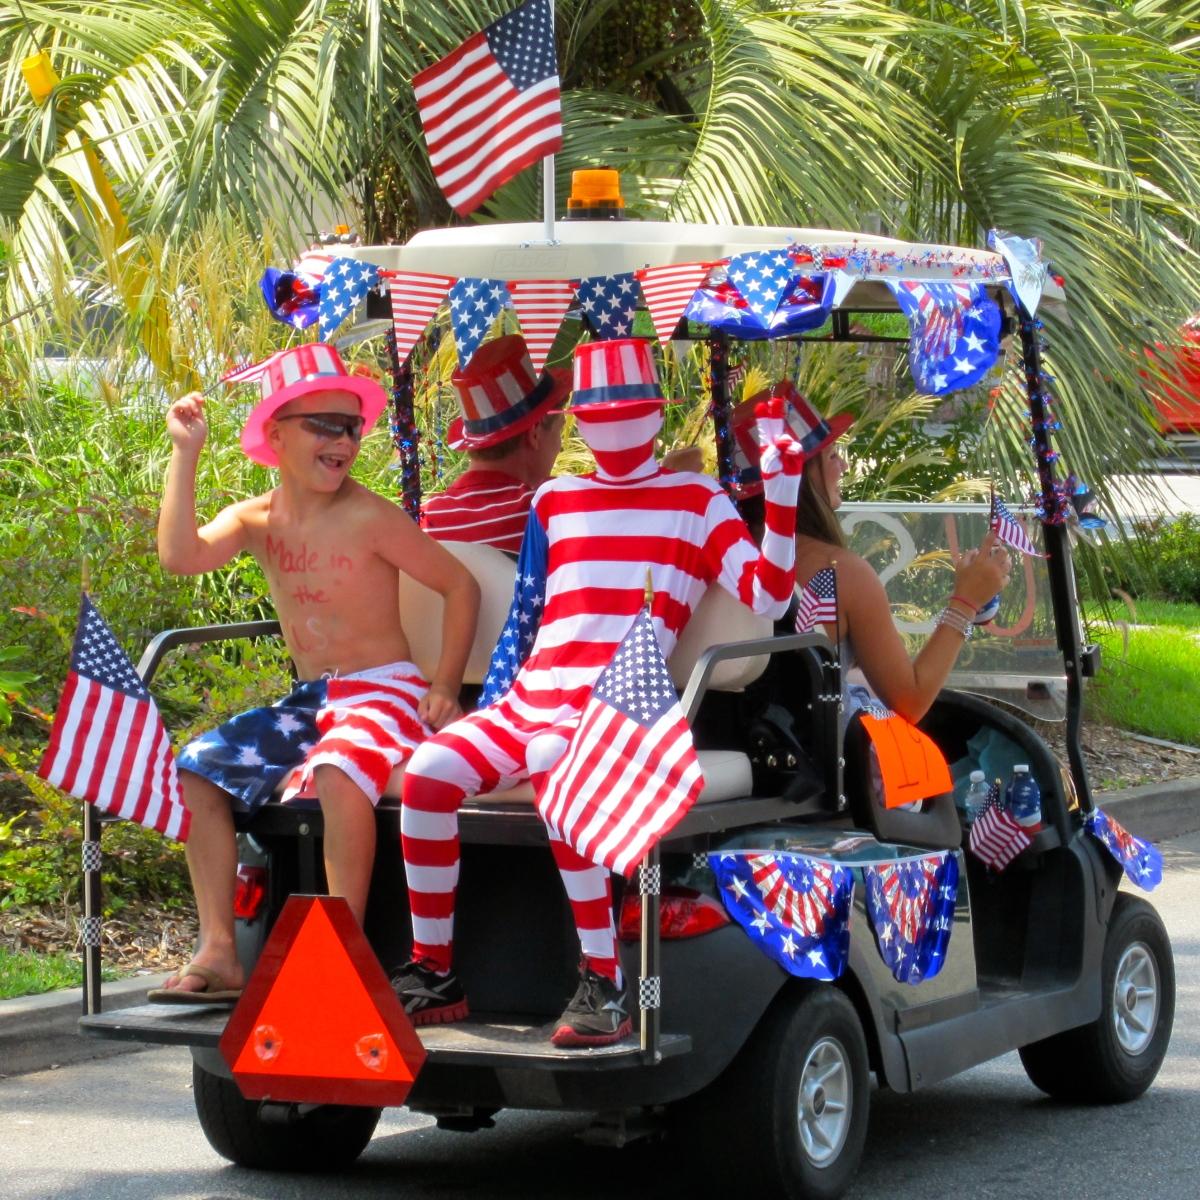 Flip-flops, Flags, and Fireworks | GALLIVANCE on betty boop july 4th, golf cart decorating ideas, golf cart christmas sleigh,